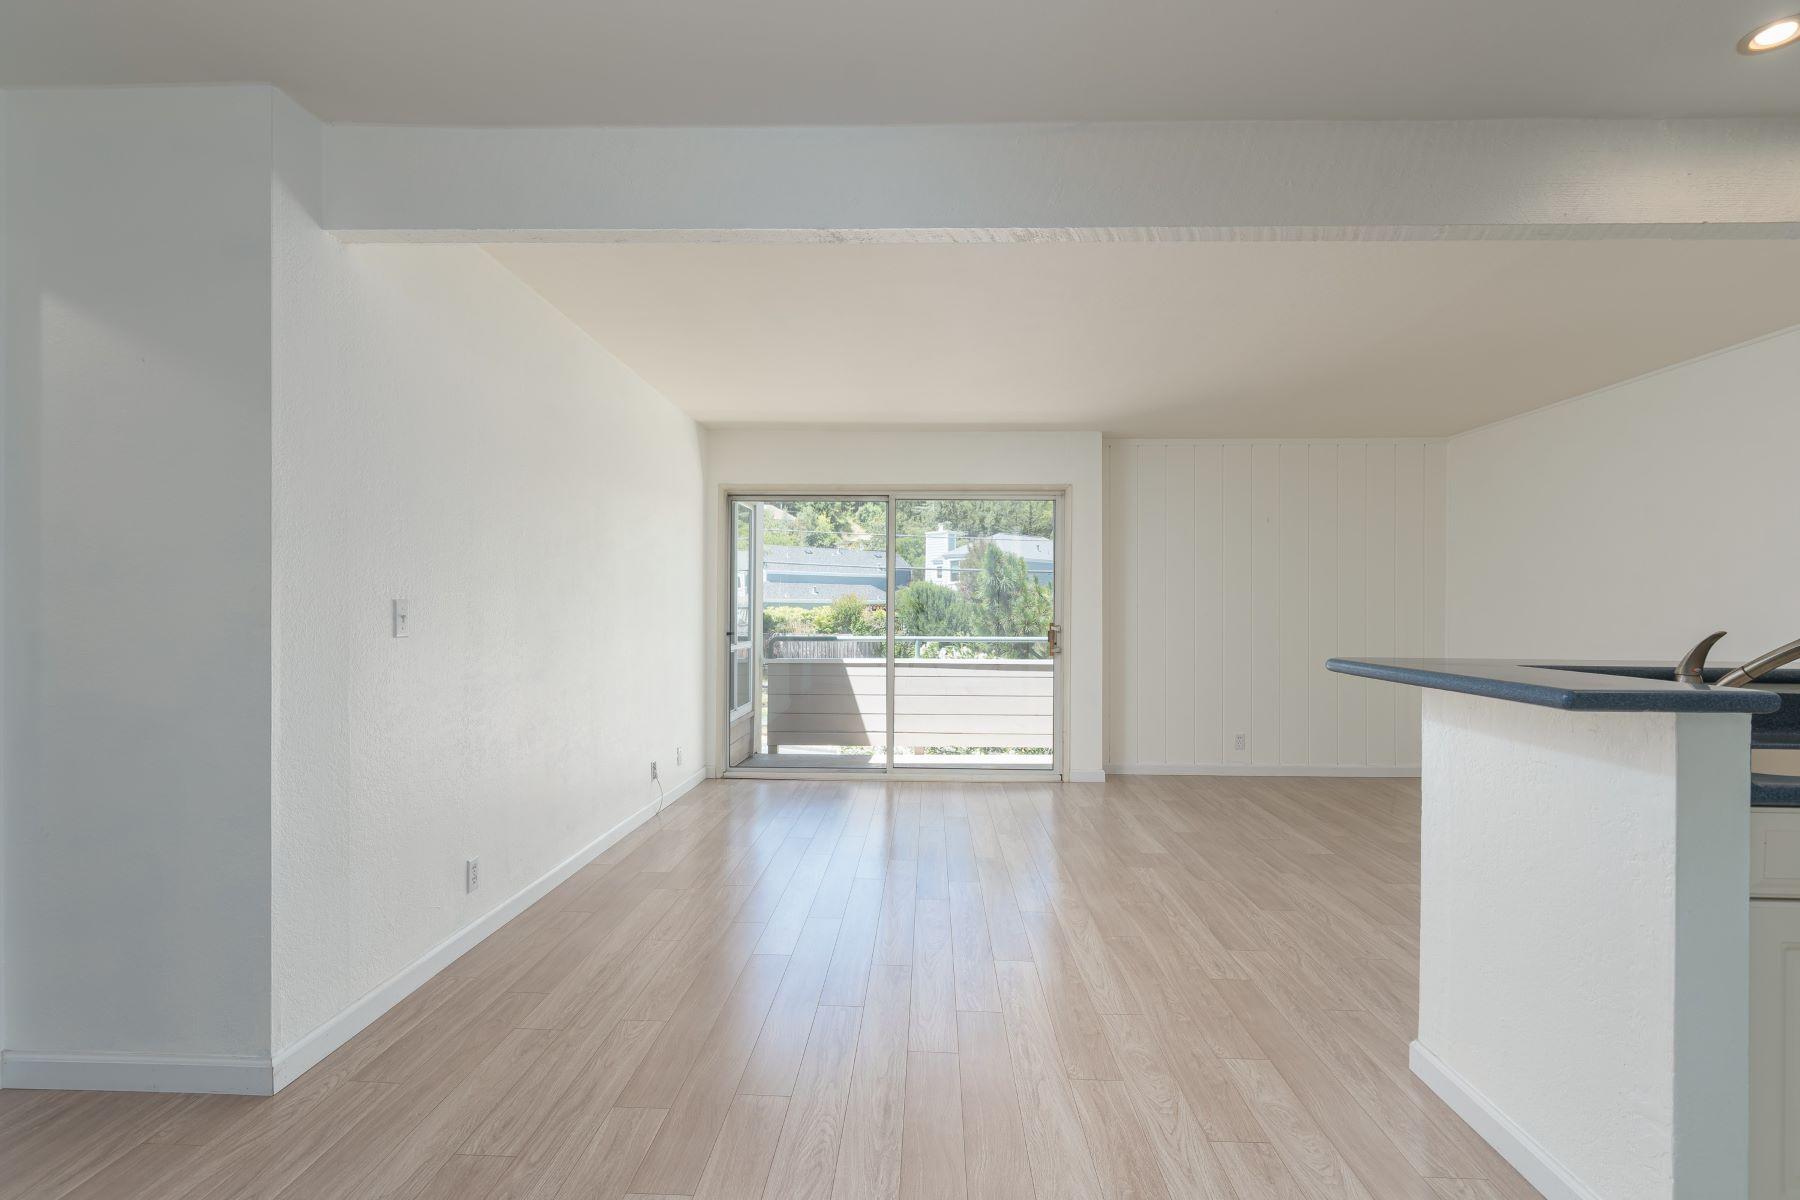 Condominiums for Active at Premier Top Floor Larkspur Residence 200 Larkspur Plaza Drive Larkspur, California 94939 United States